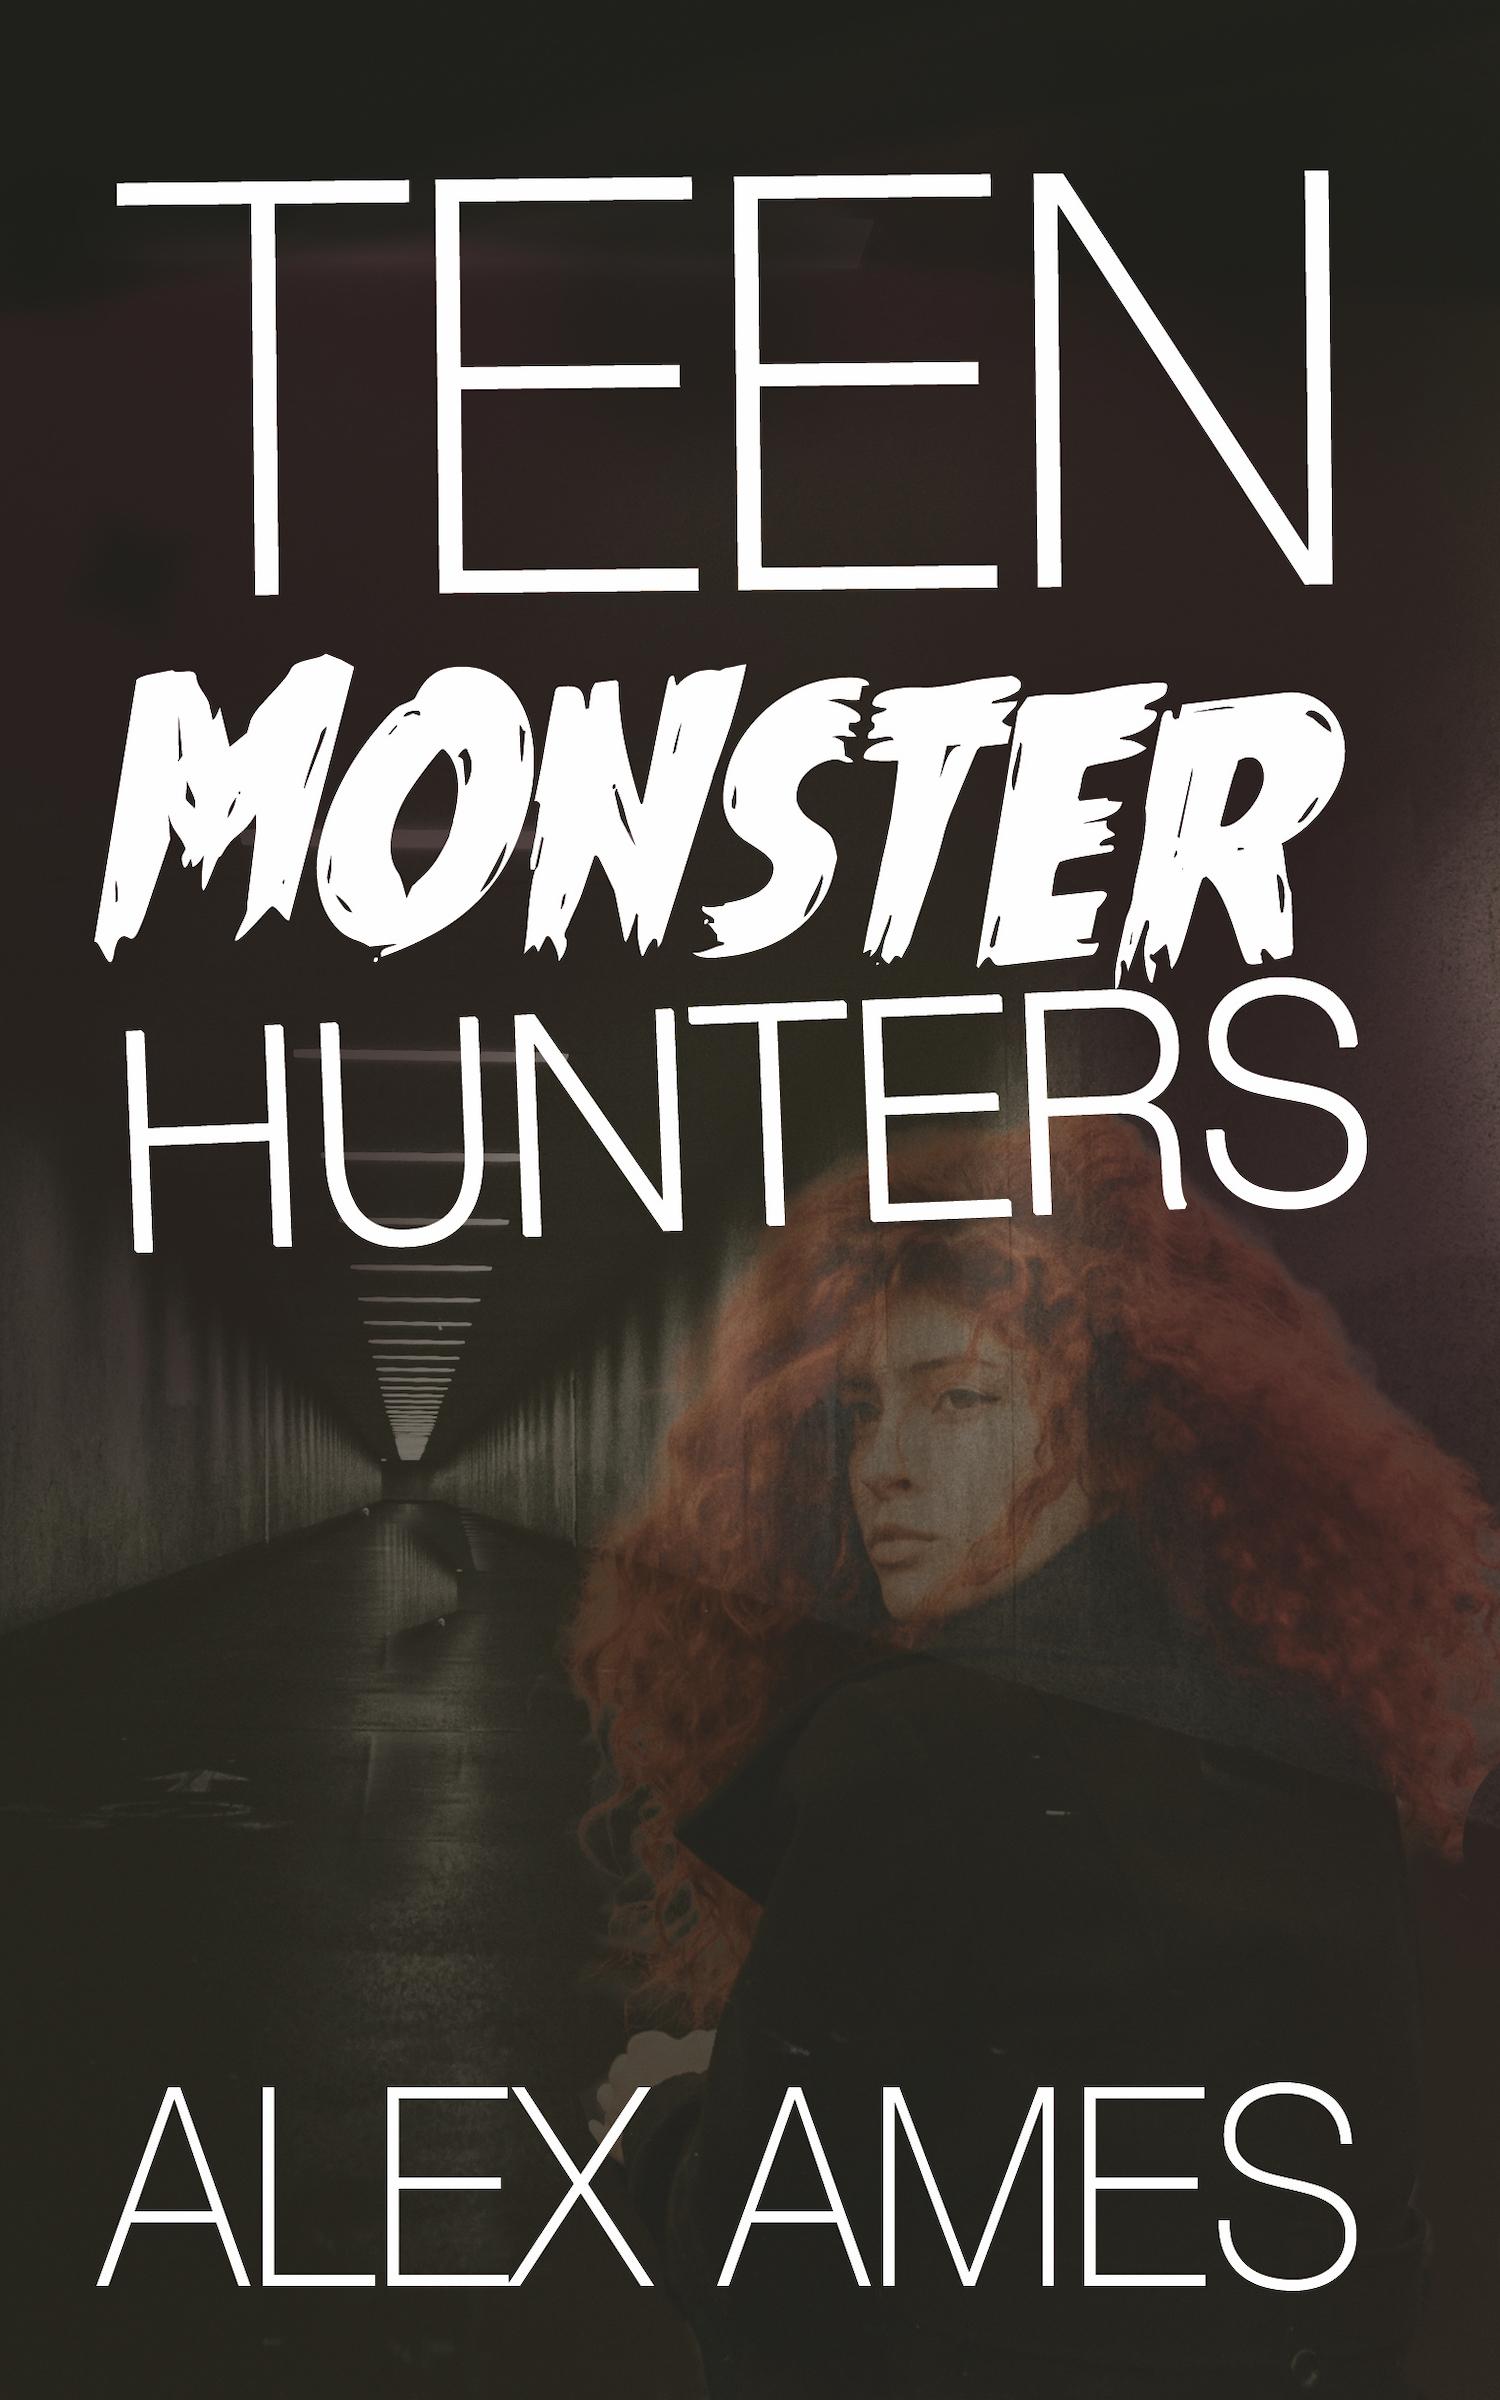 Teen Monster Hunters